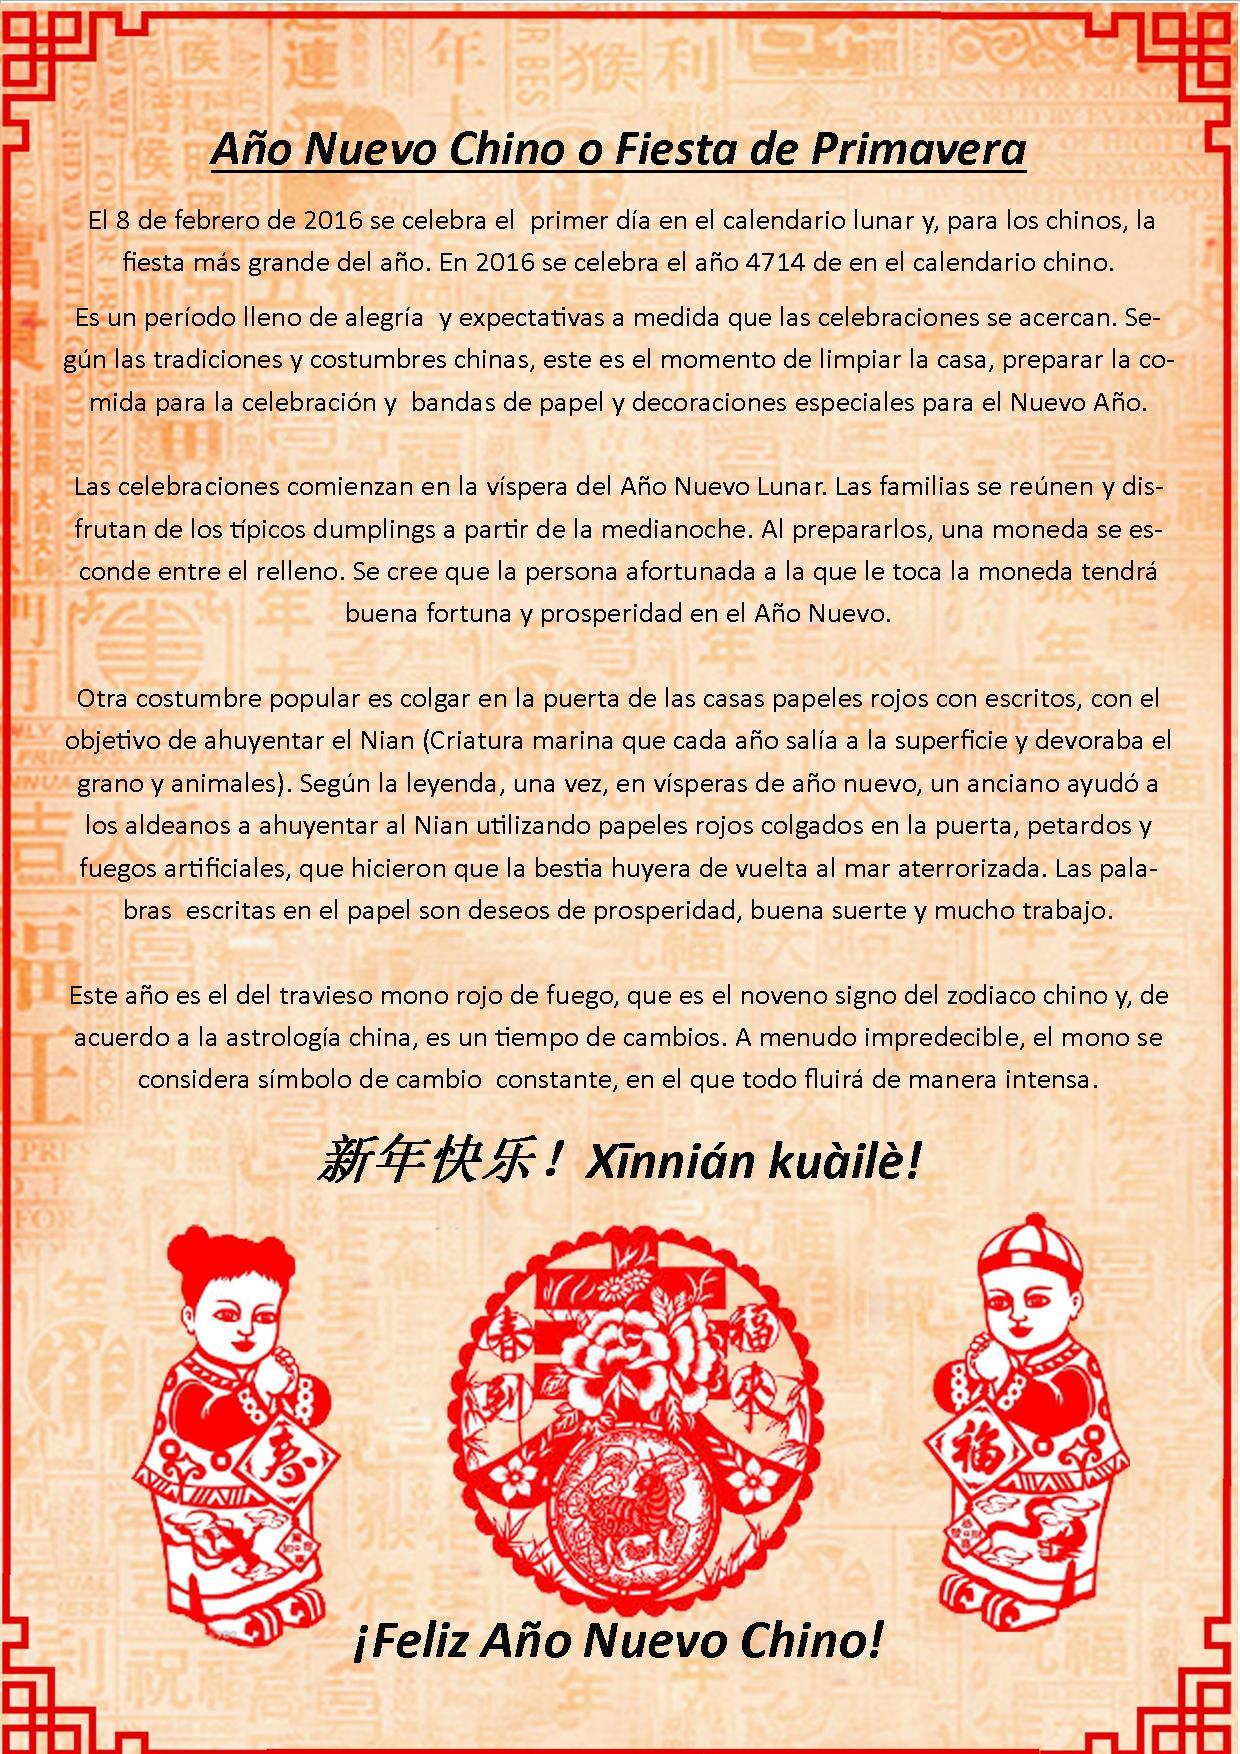 Fiesta de Primavera o Año Nuevo Chino - imagen 2